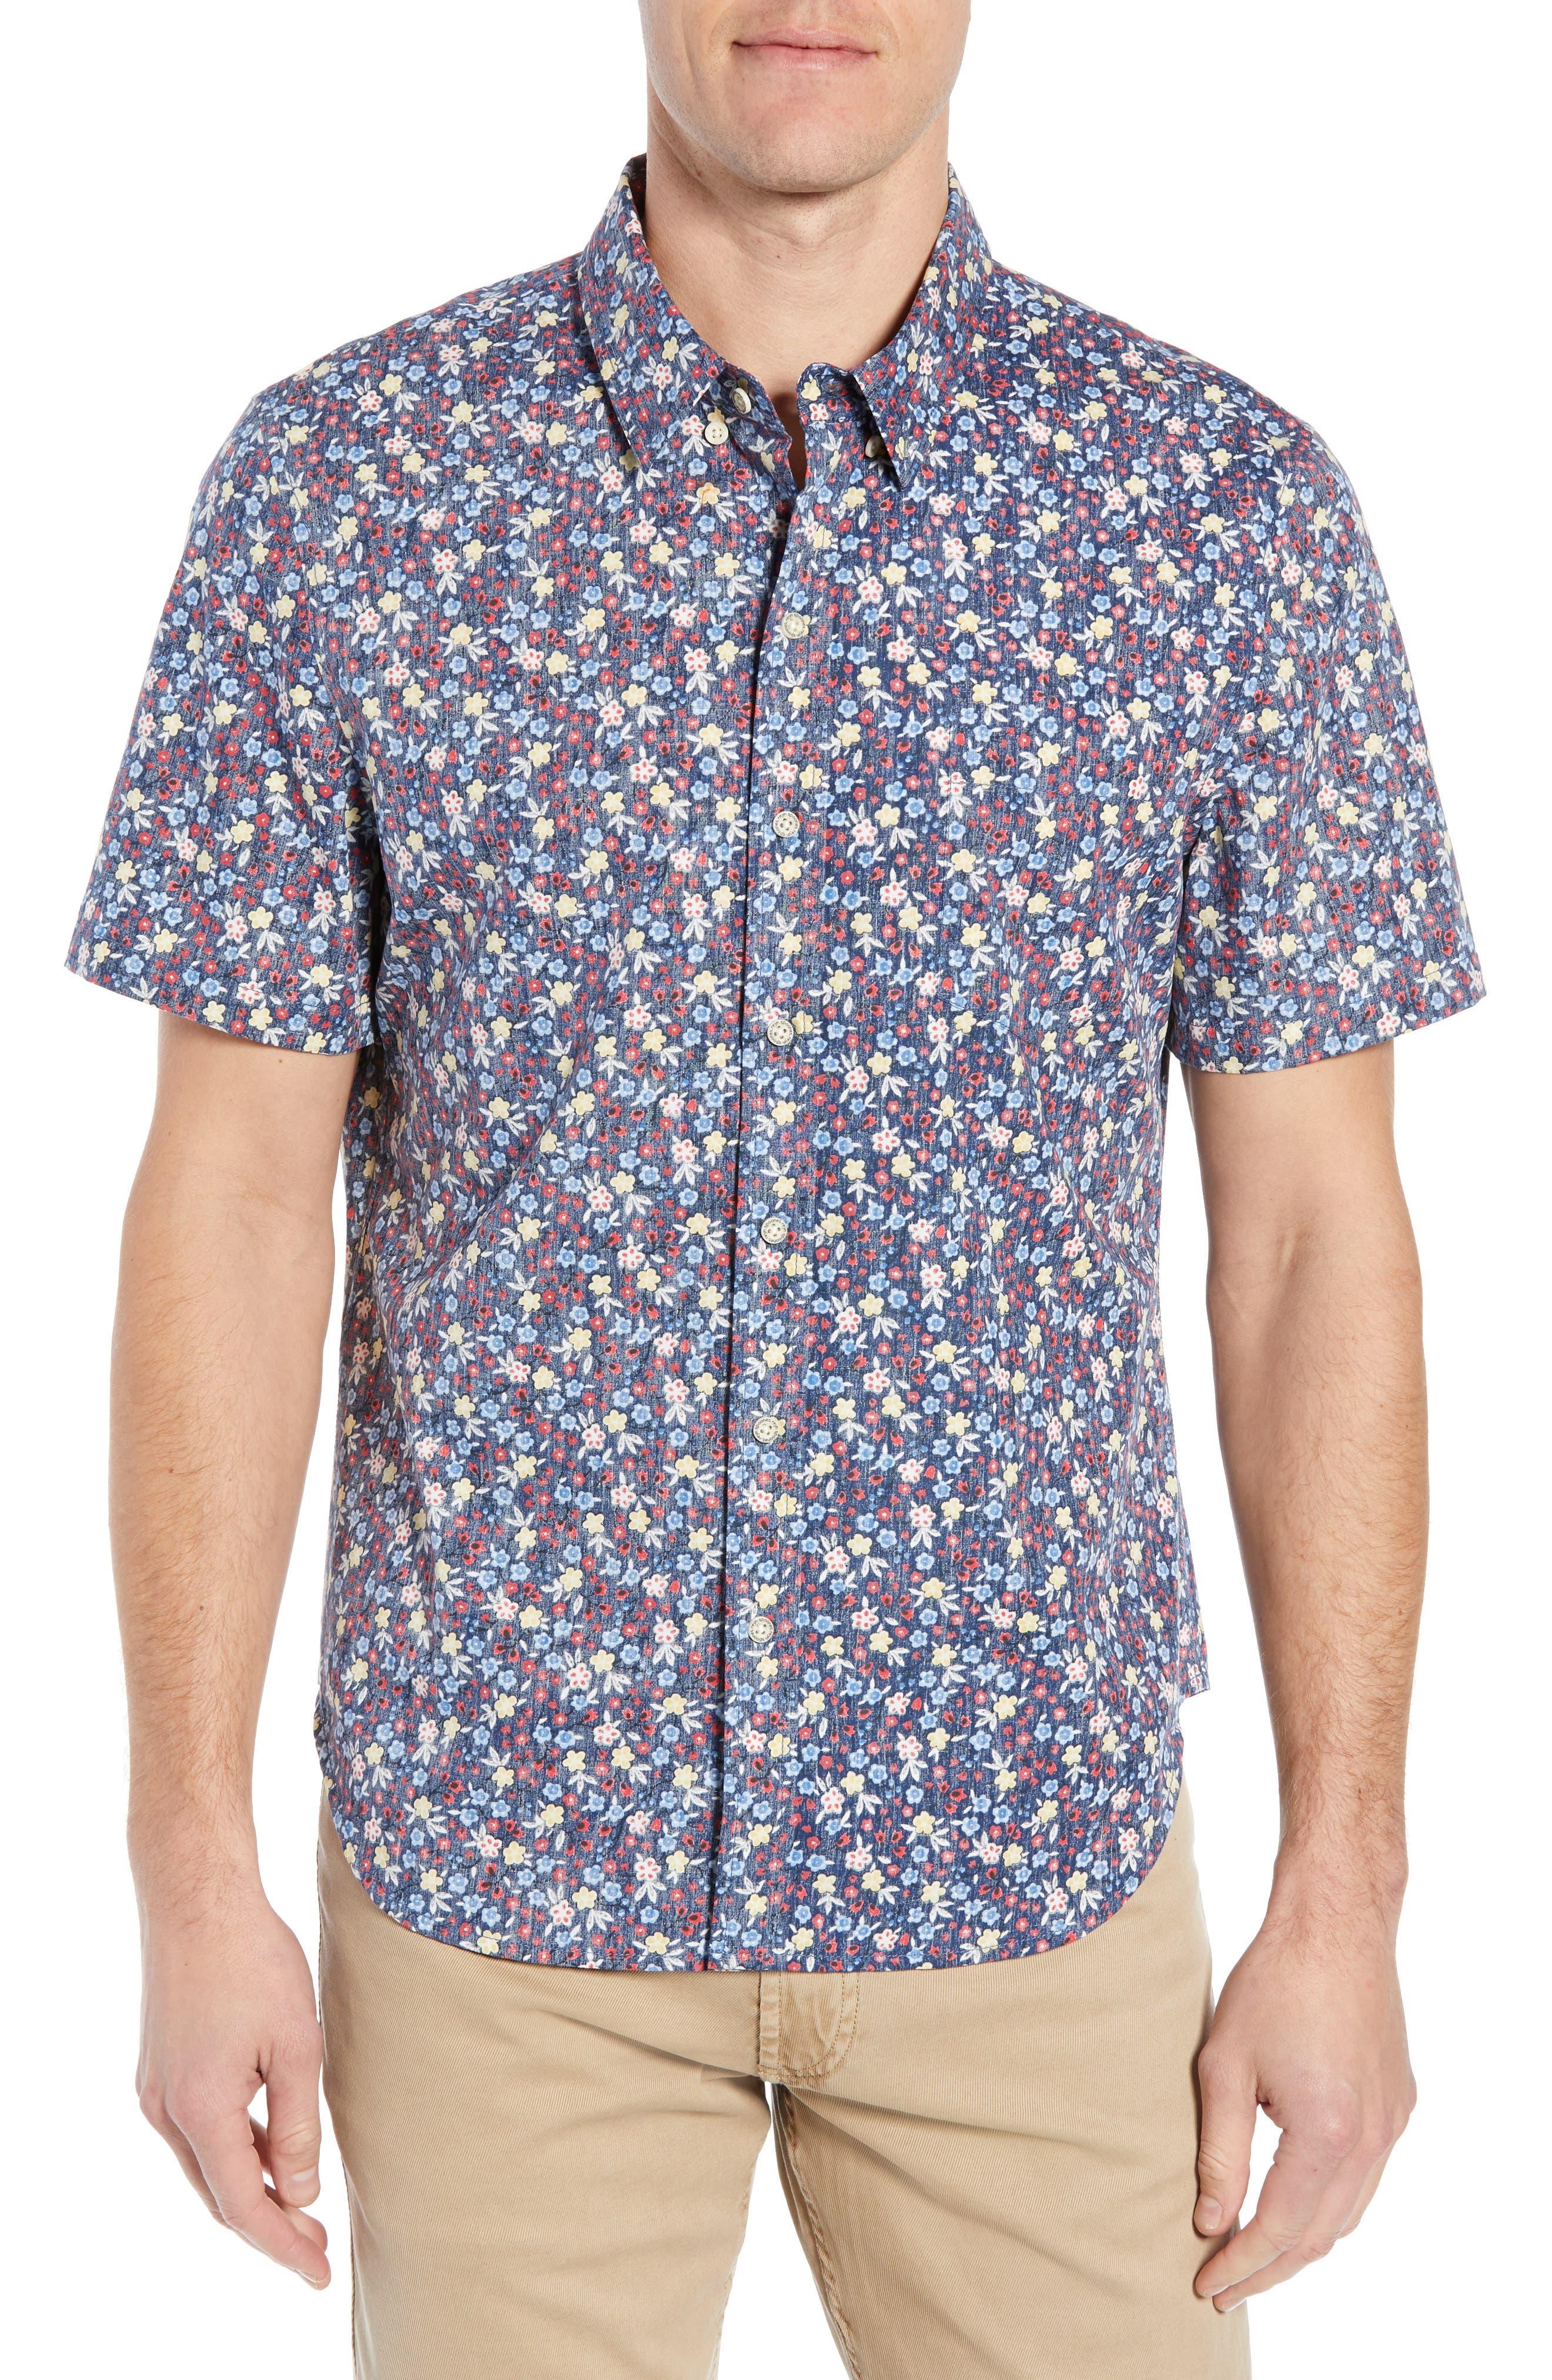 REYN SPOONER Retro Tailored Fit Sport Shirt, Main, color, MEDIEVAL BLUE